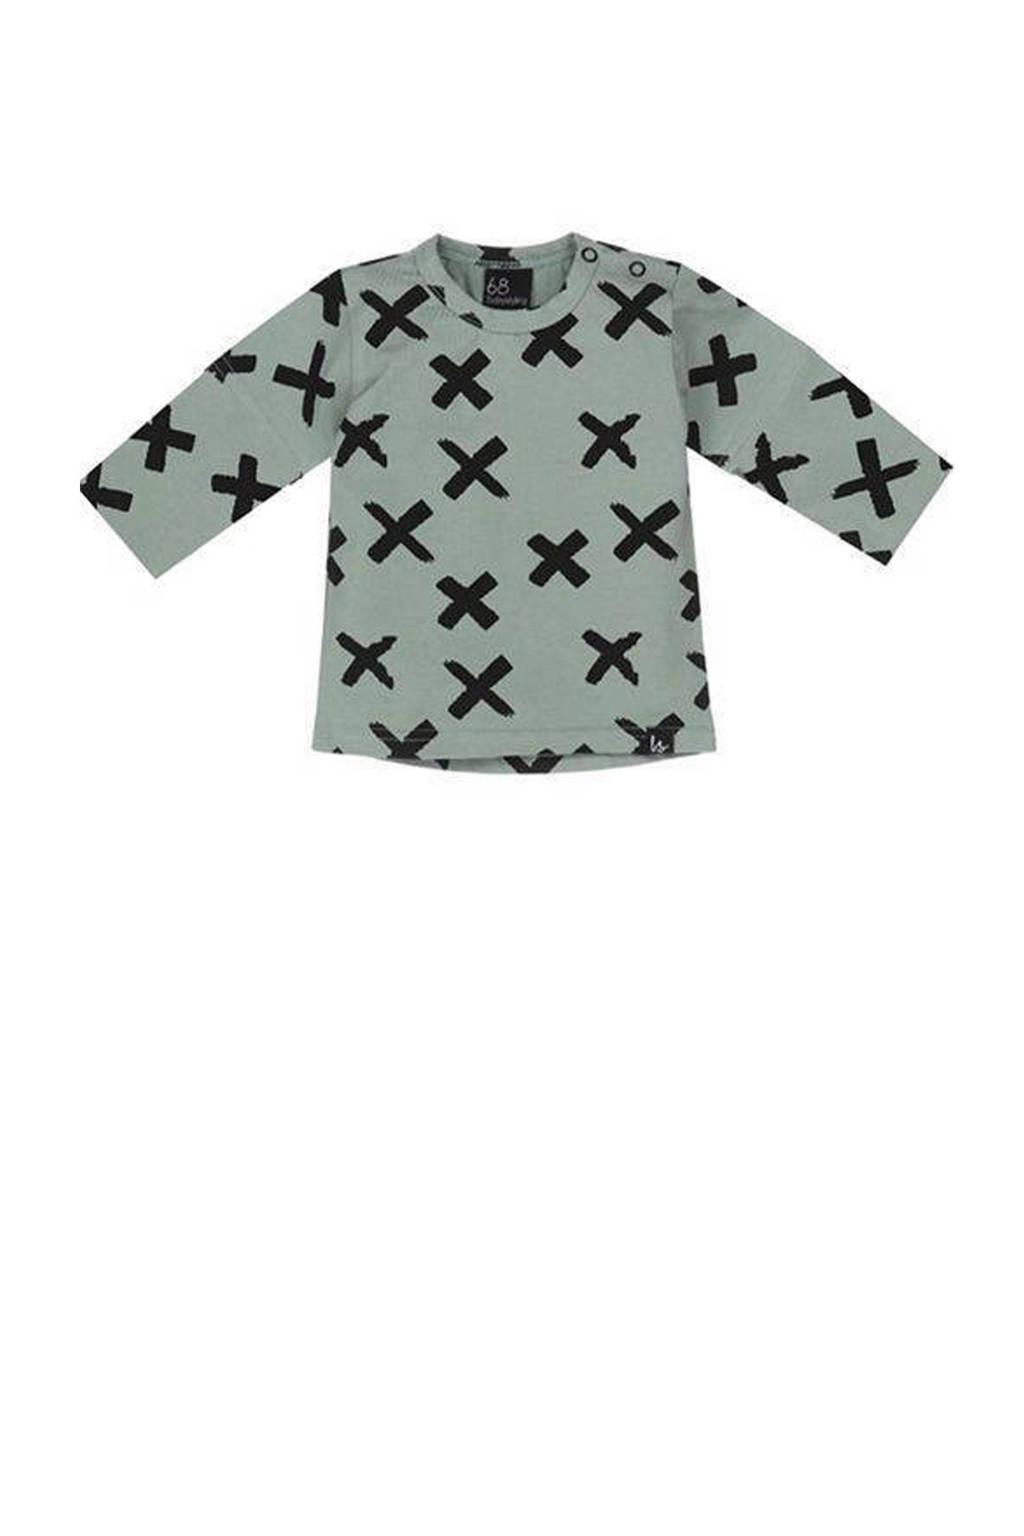 Babystyling longsleeve met all over print grijsgroen/zwart, Grijsgroen/zwart